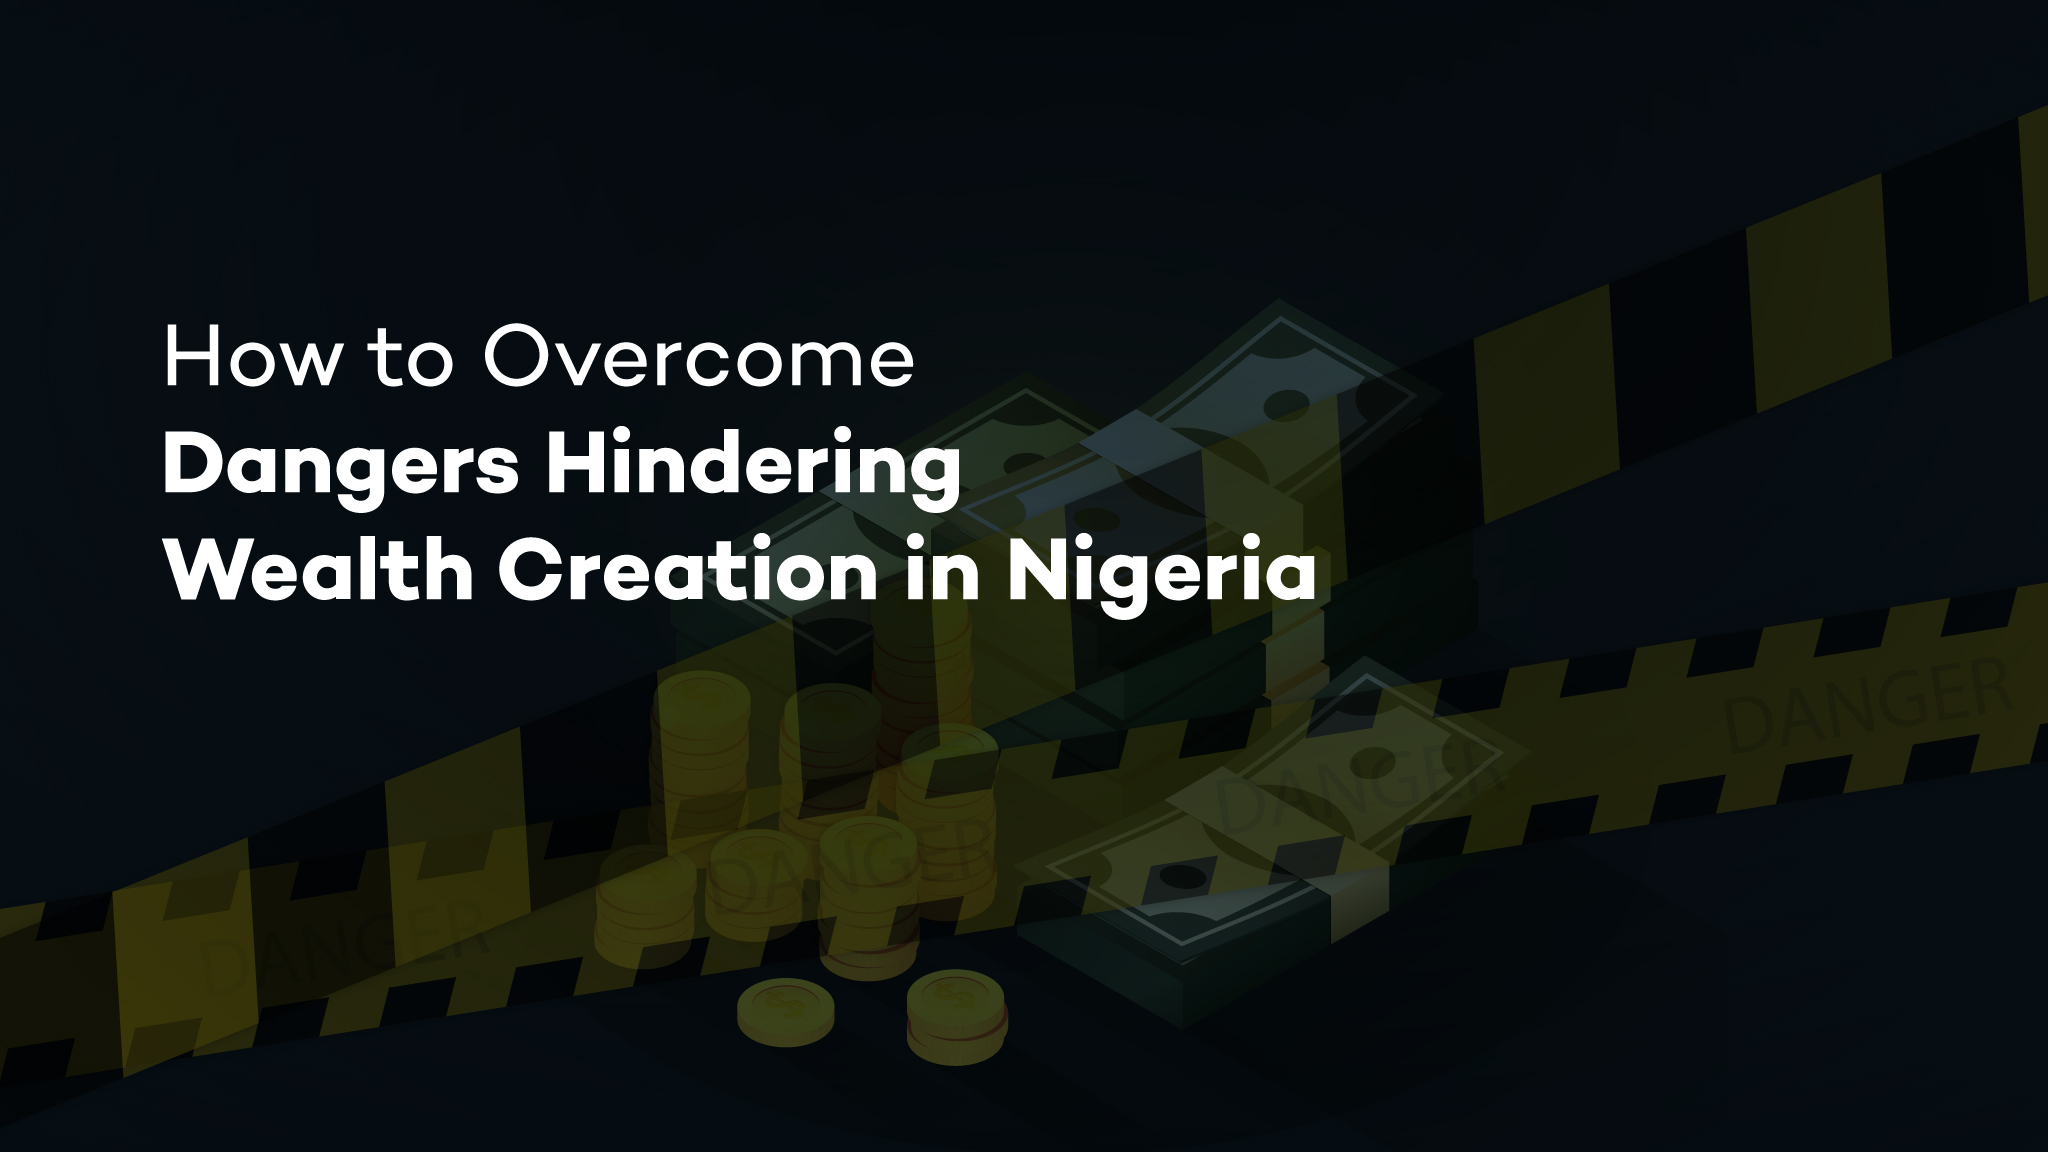 wealth creation in Nigeria